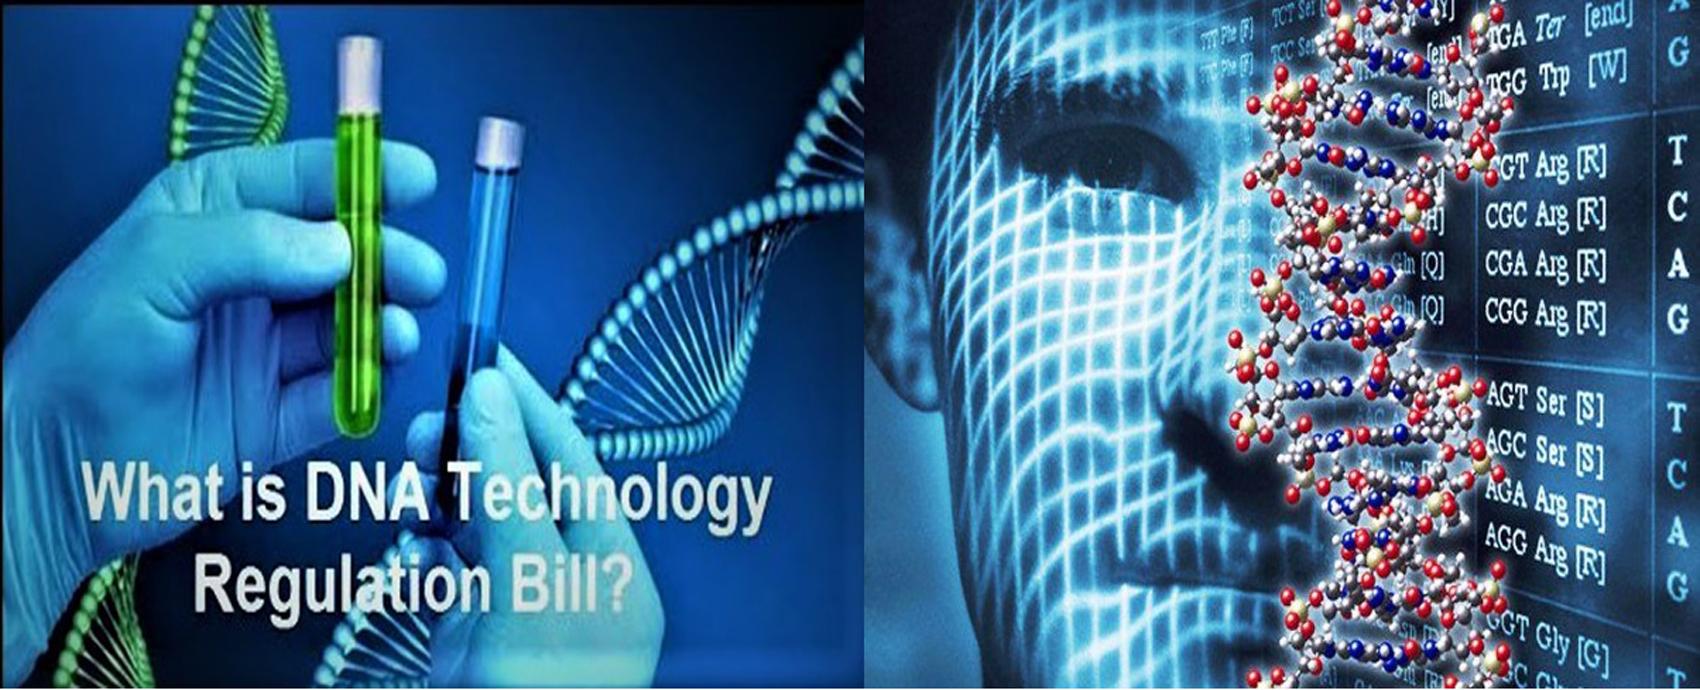 आखिर मोदी सरकार क्यों आतुर है DNA प्रोफाइलिंग बिल (DNA Technology Regulation Bill) लाने के लिए ?